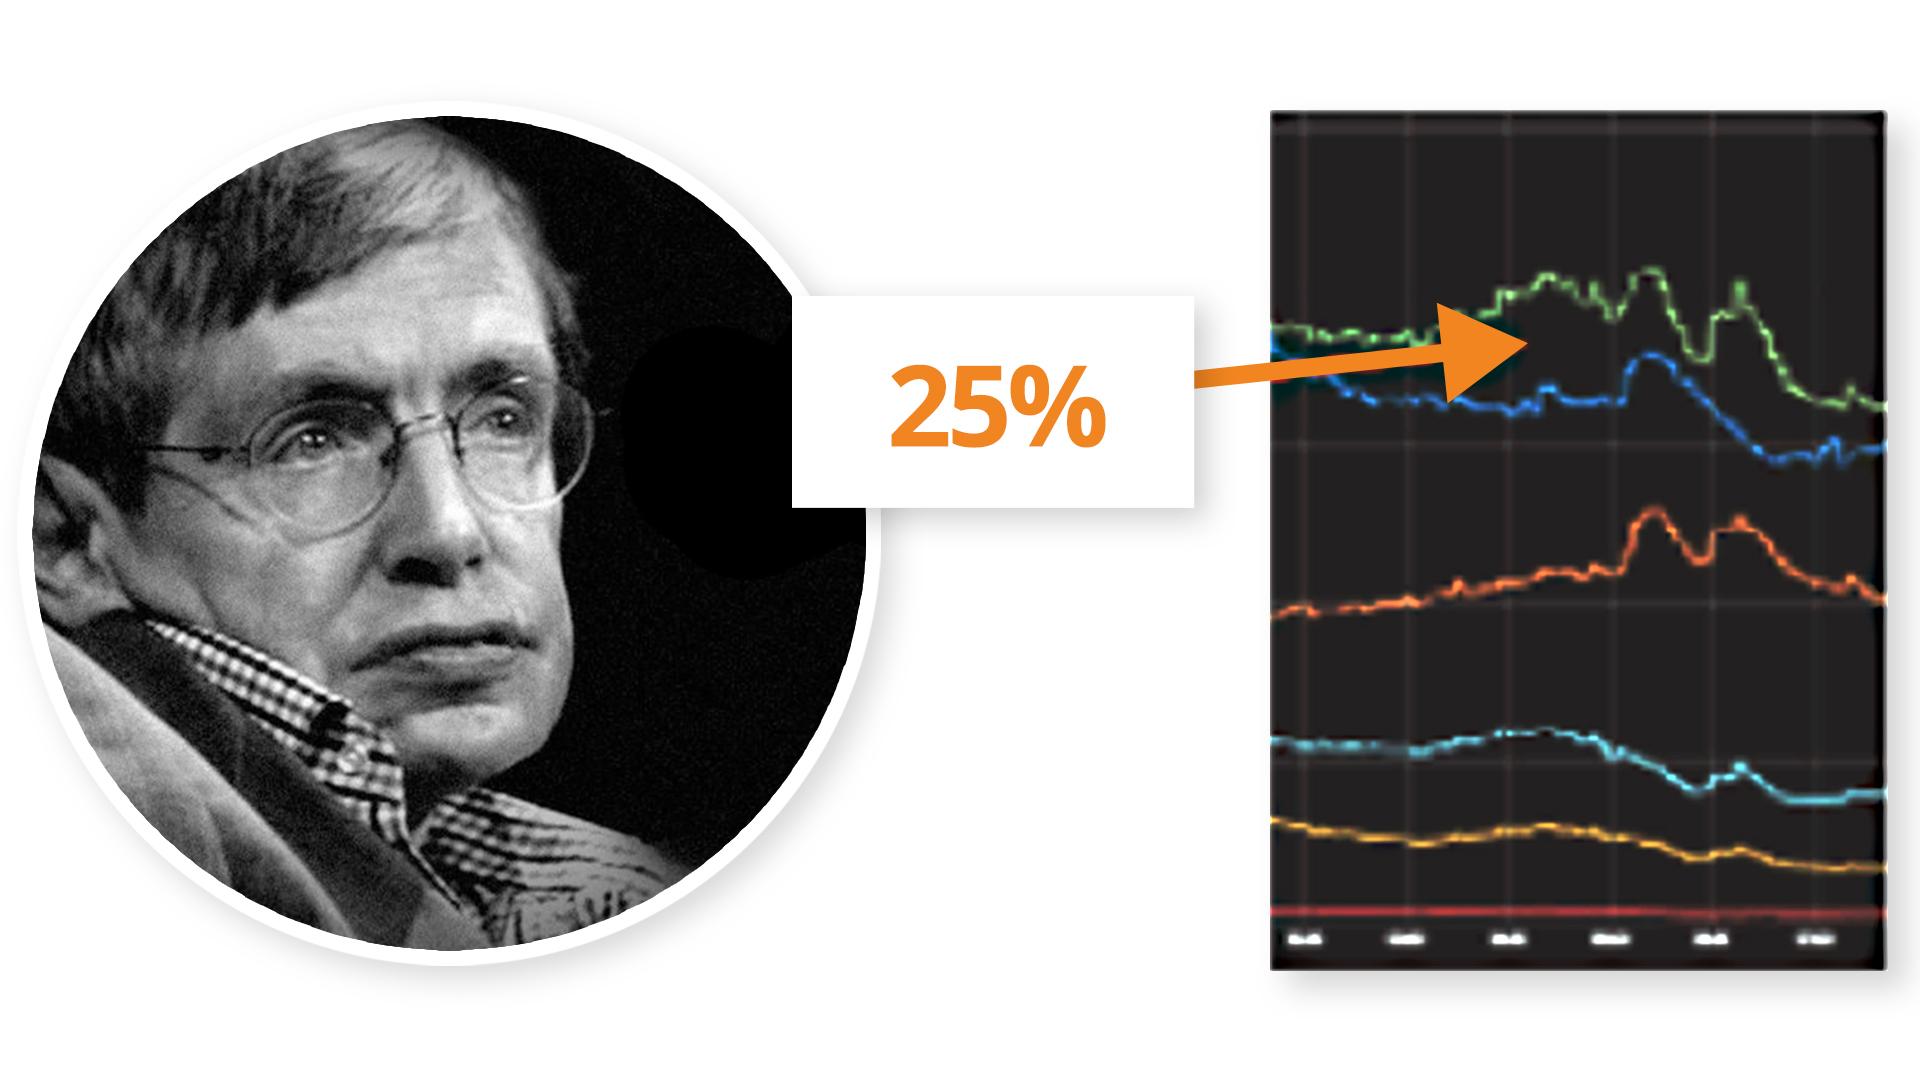 Stephen Hawking's death- Outbrain traffic impact